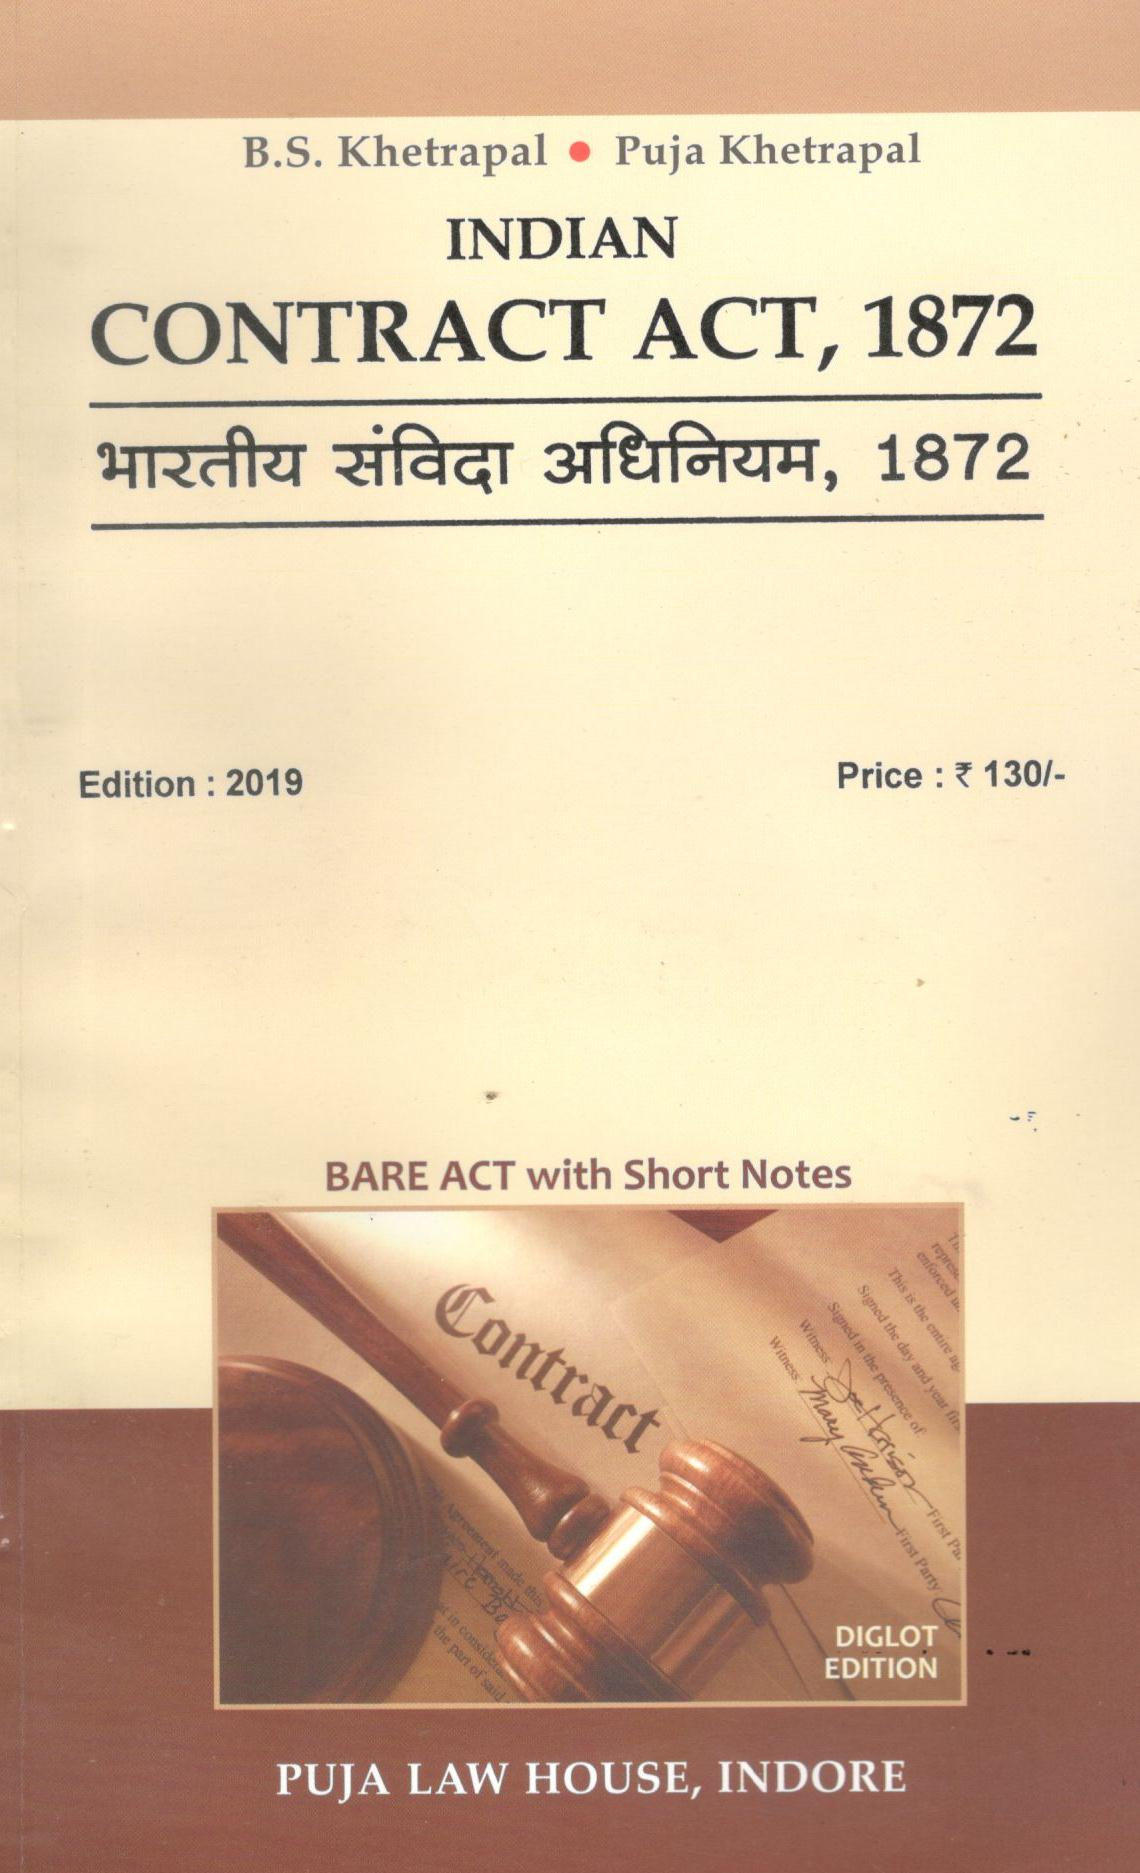 भारतीय संविदा अधिनियम, 1872 / Indian Contract Act, 1872